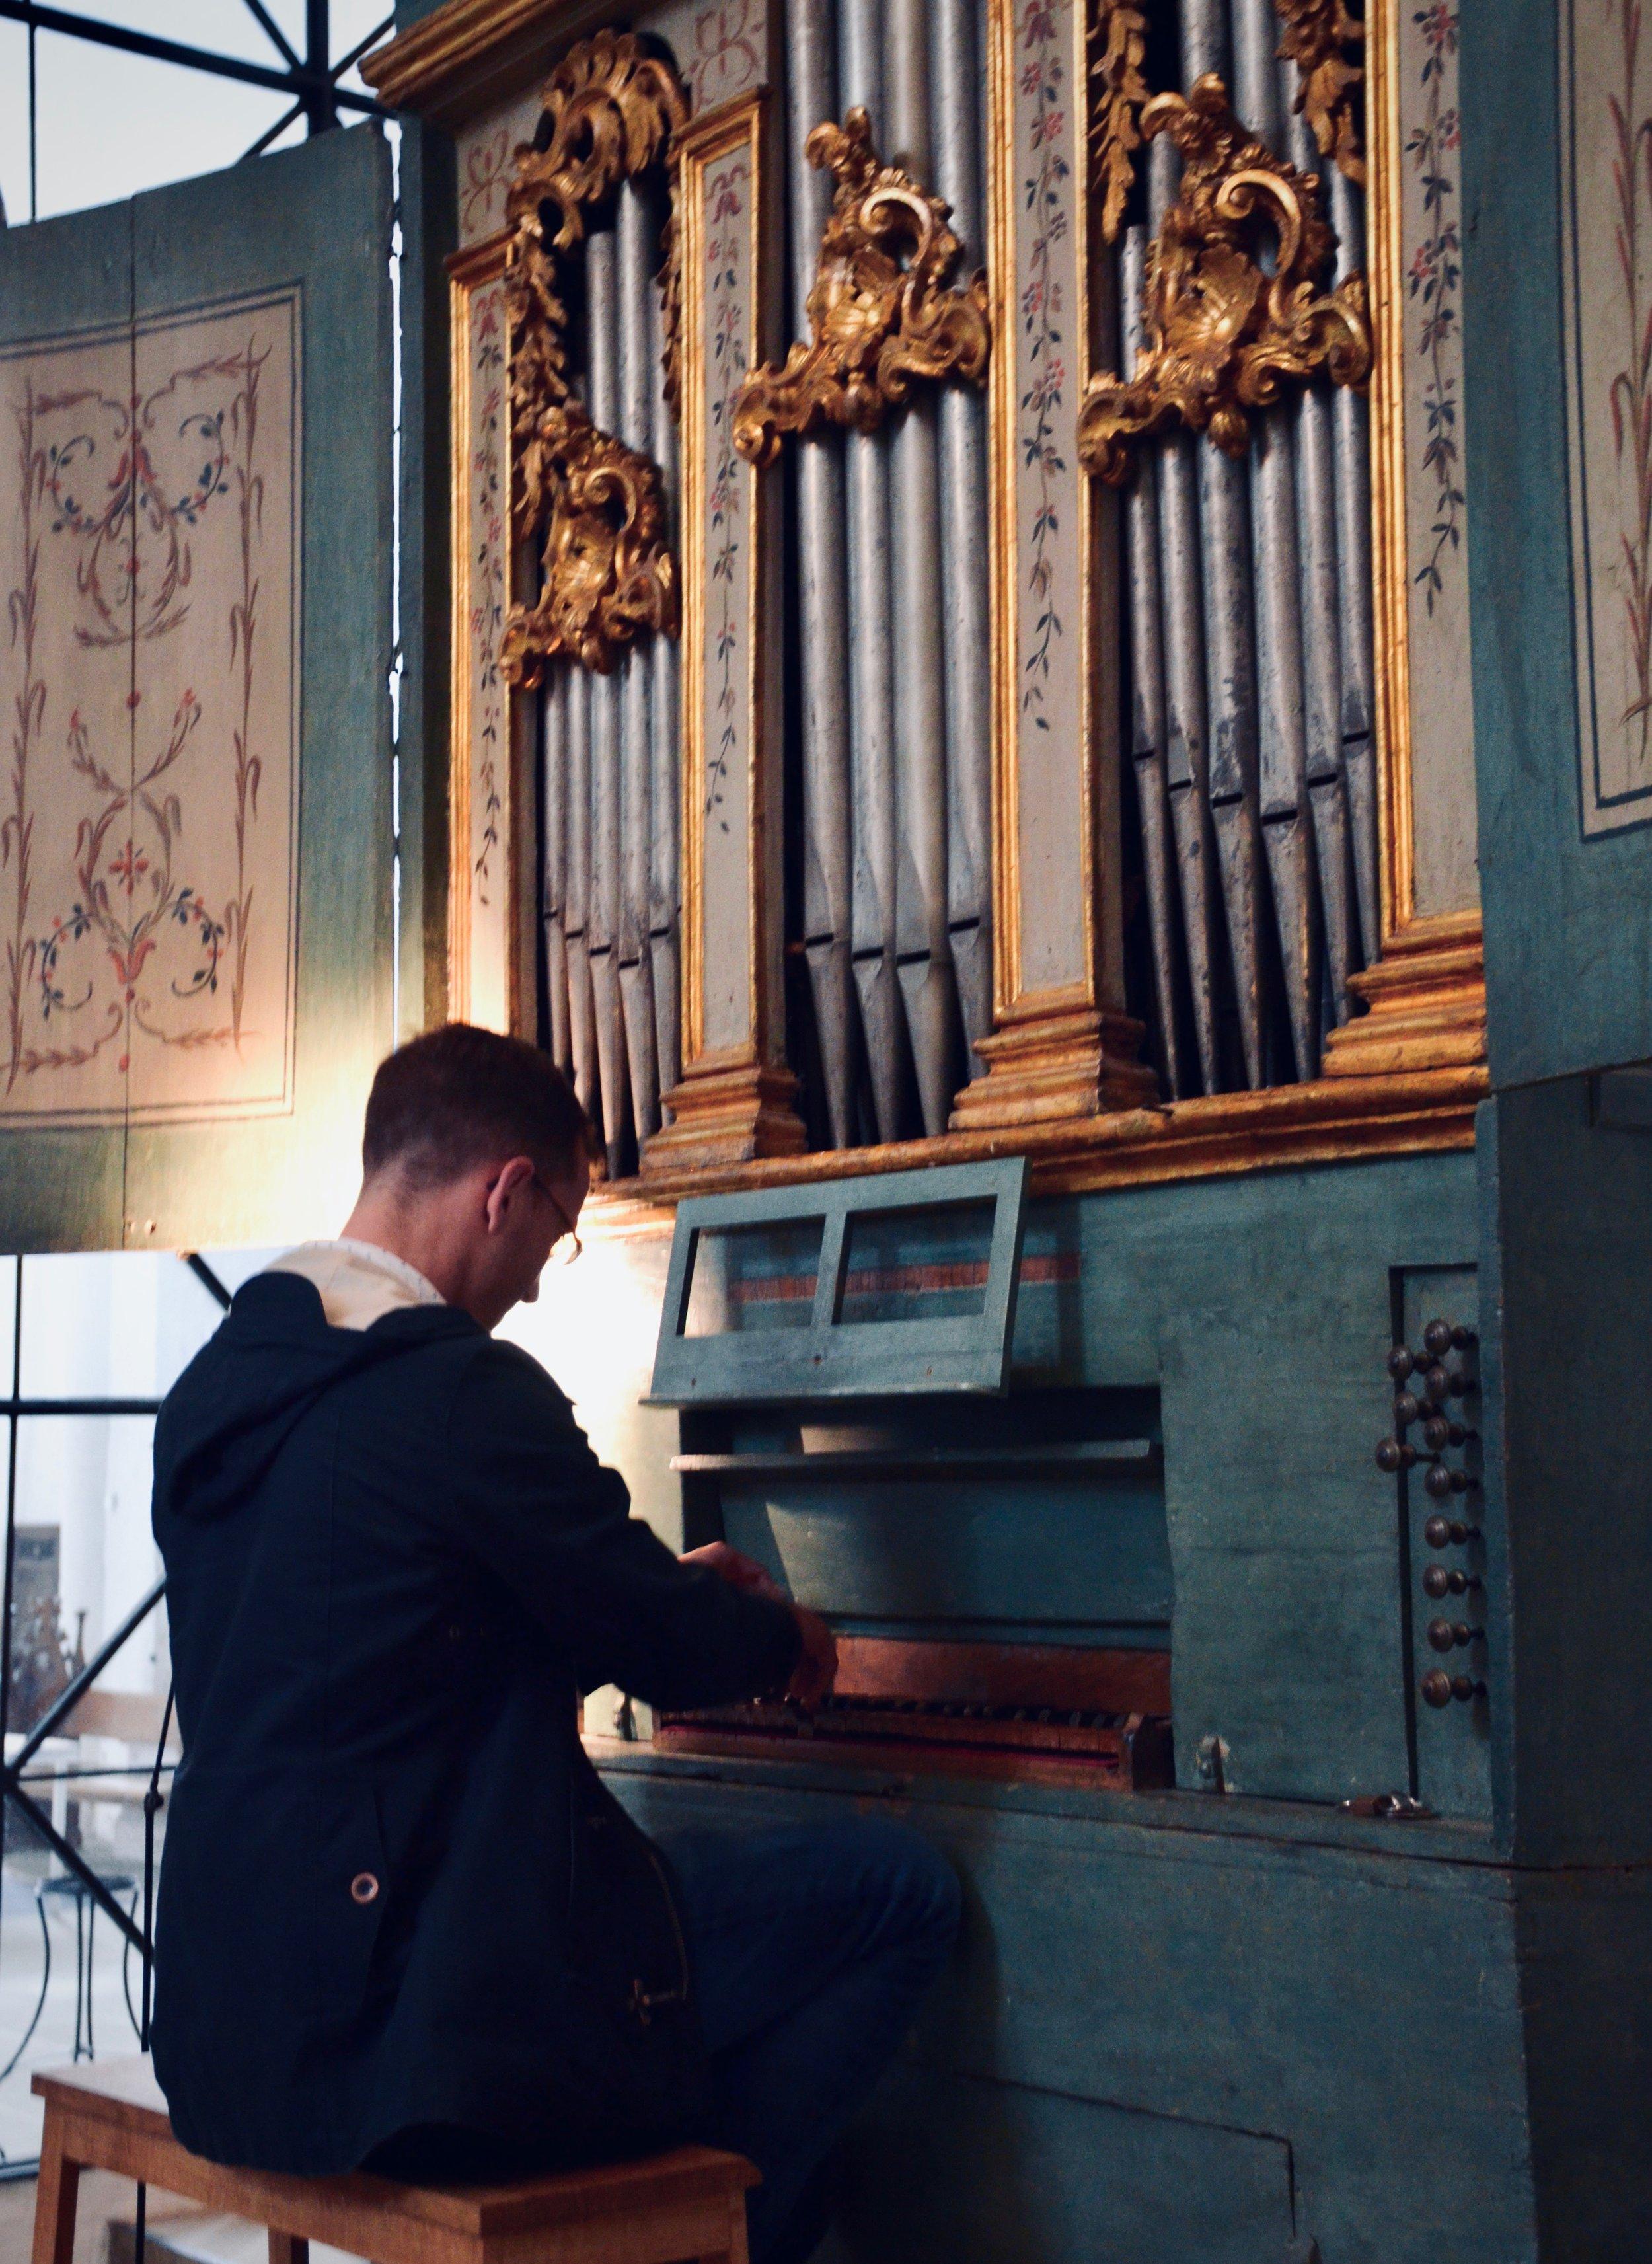 Christian Lane plays the 1777 Italian Baroque organ in Lübeck Dom.